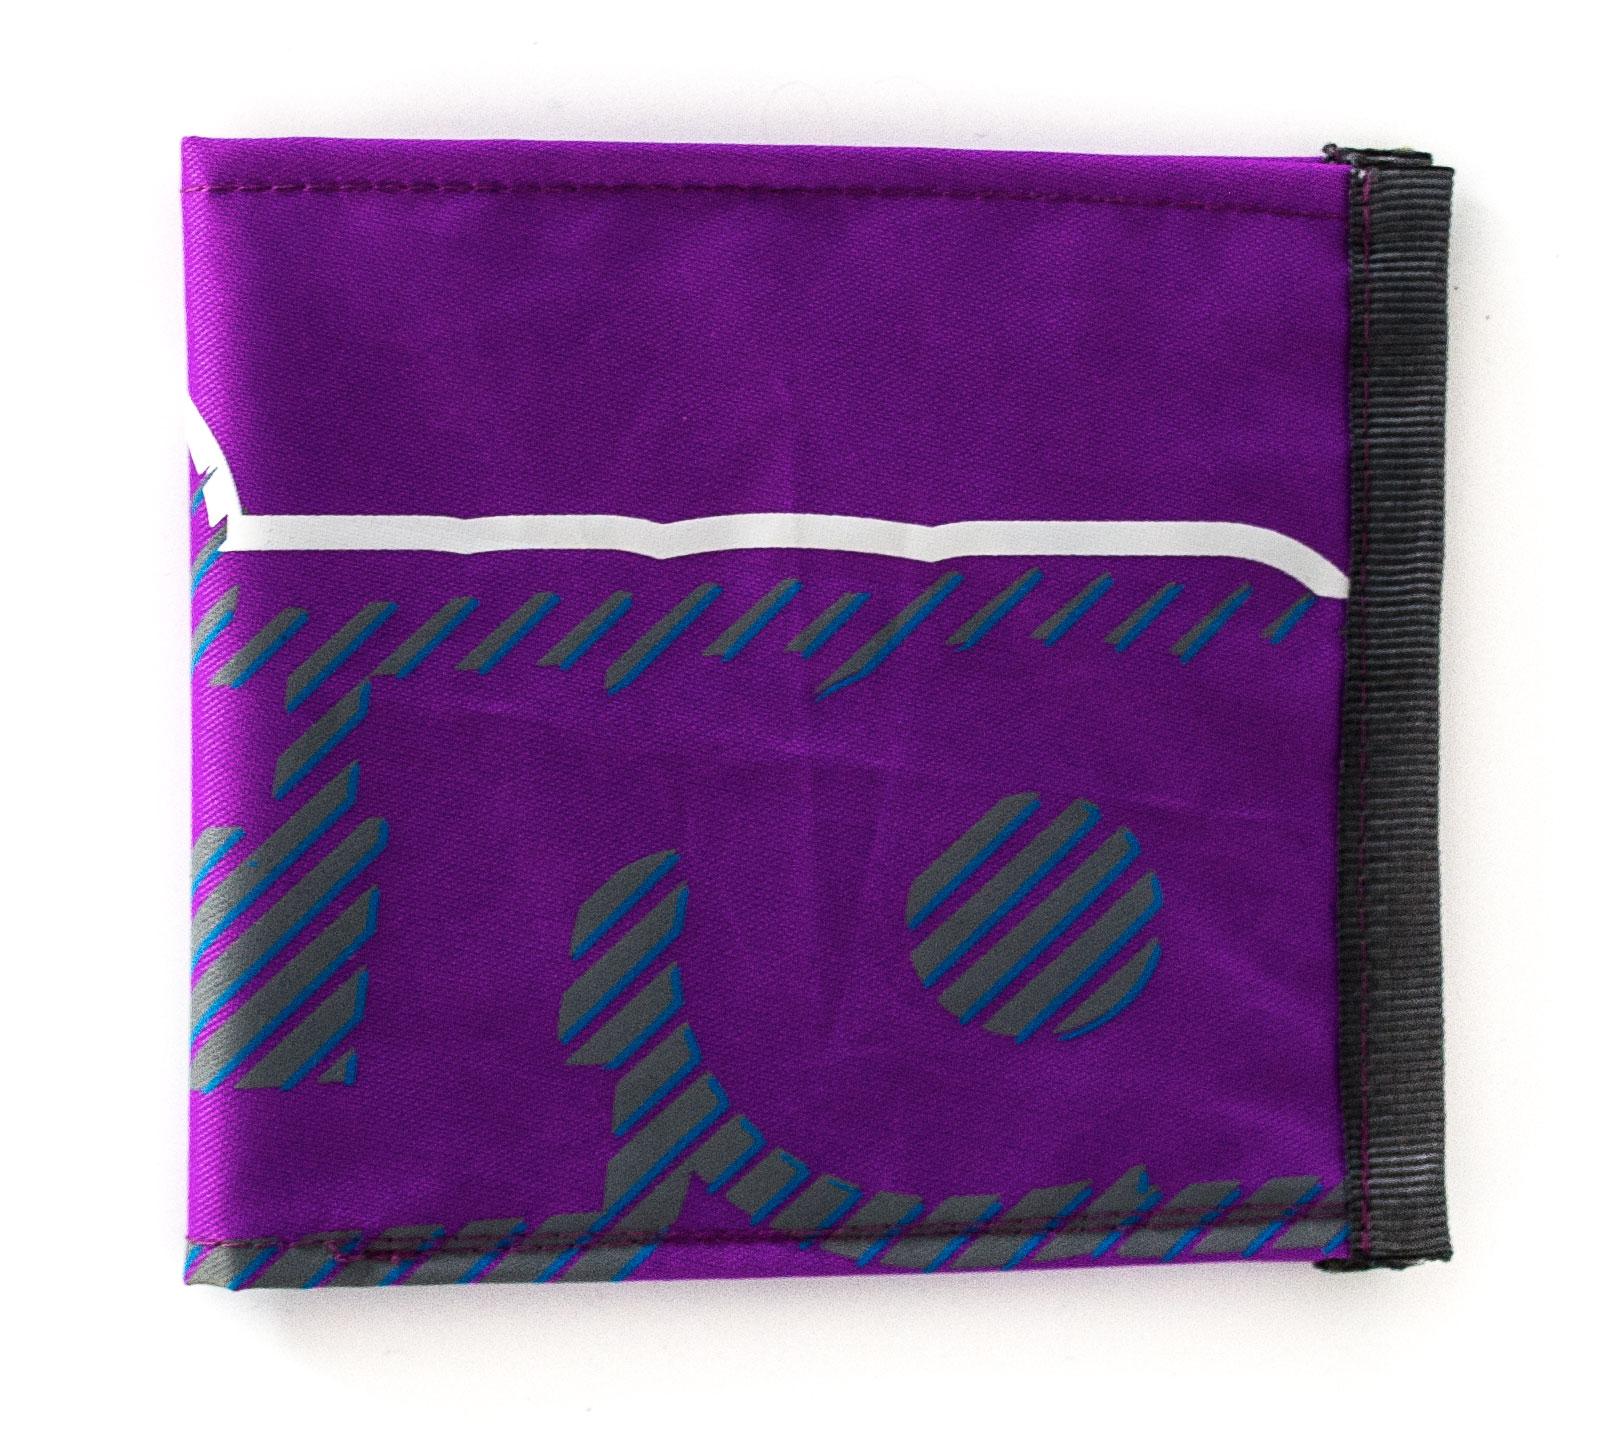 ReSailCle - Gaastra purple II pénztárca